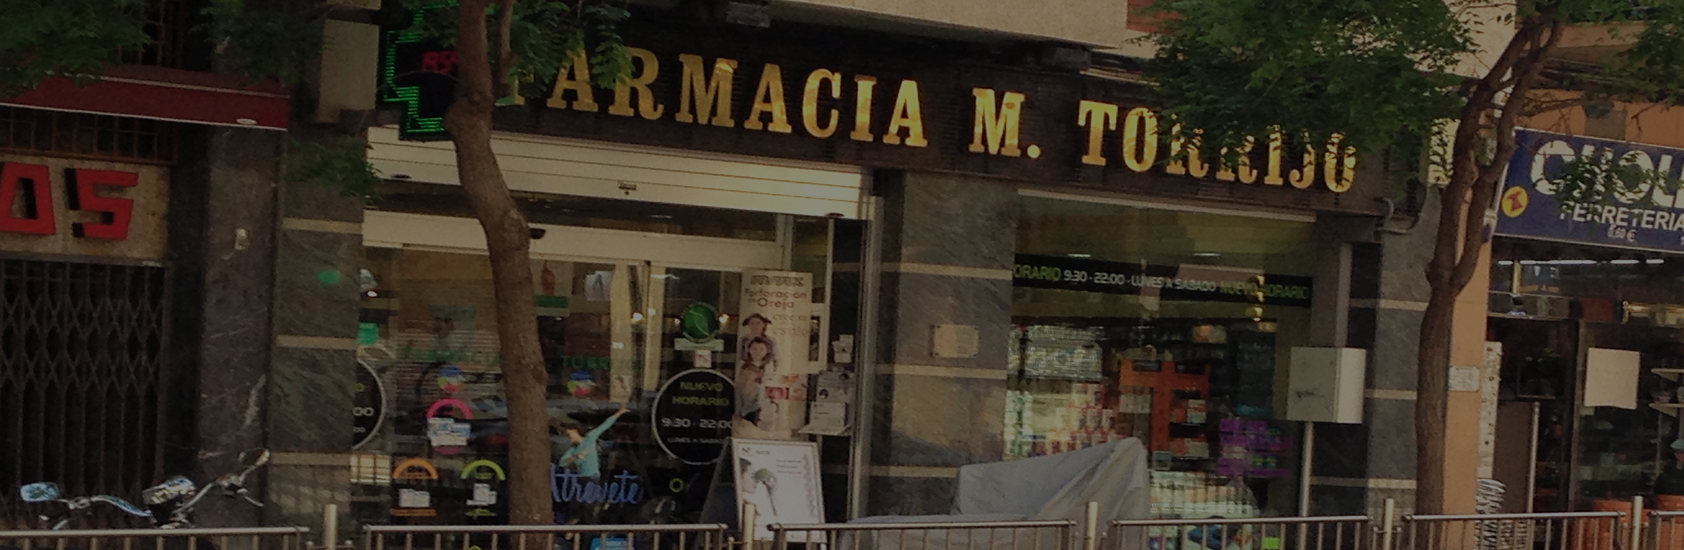 M TORRIJO FARMACIA